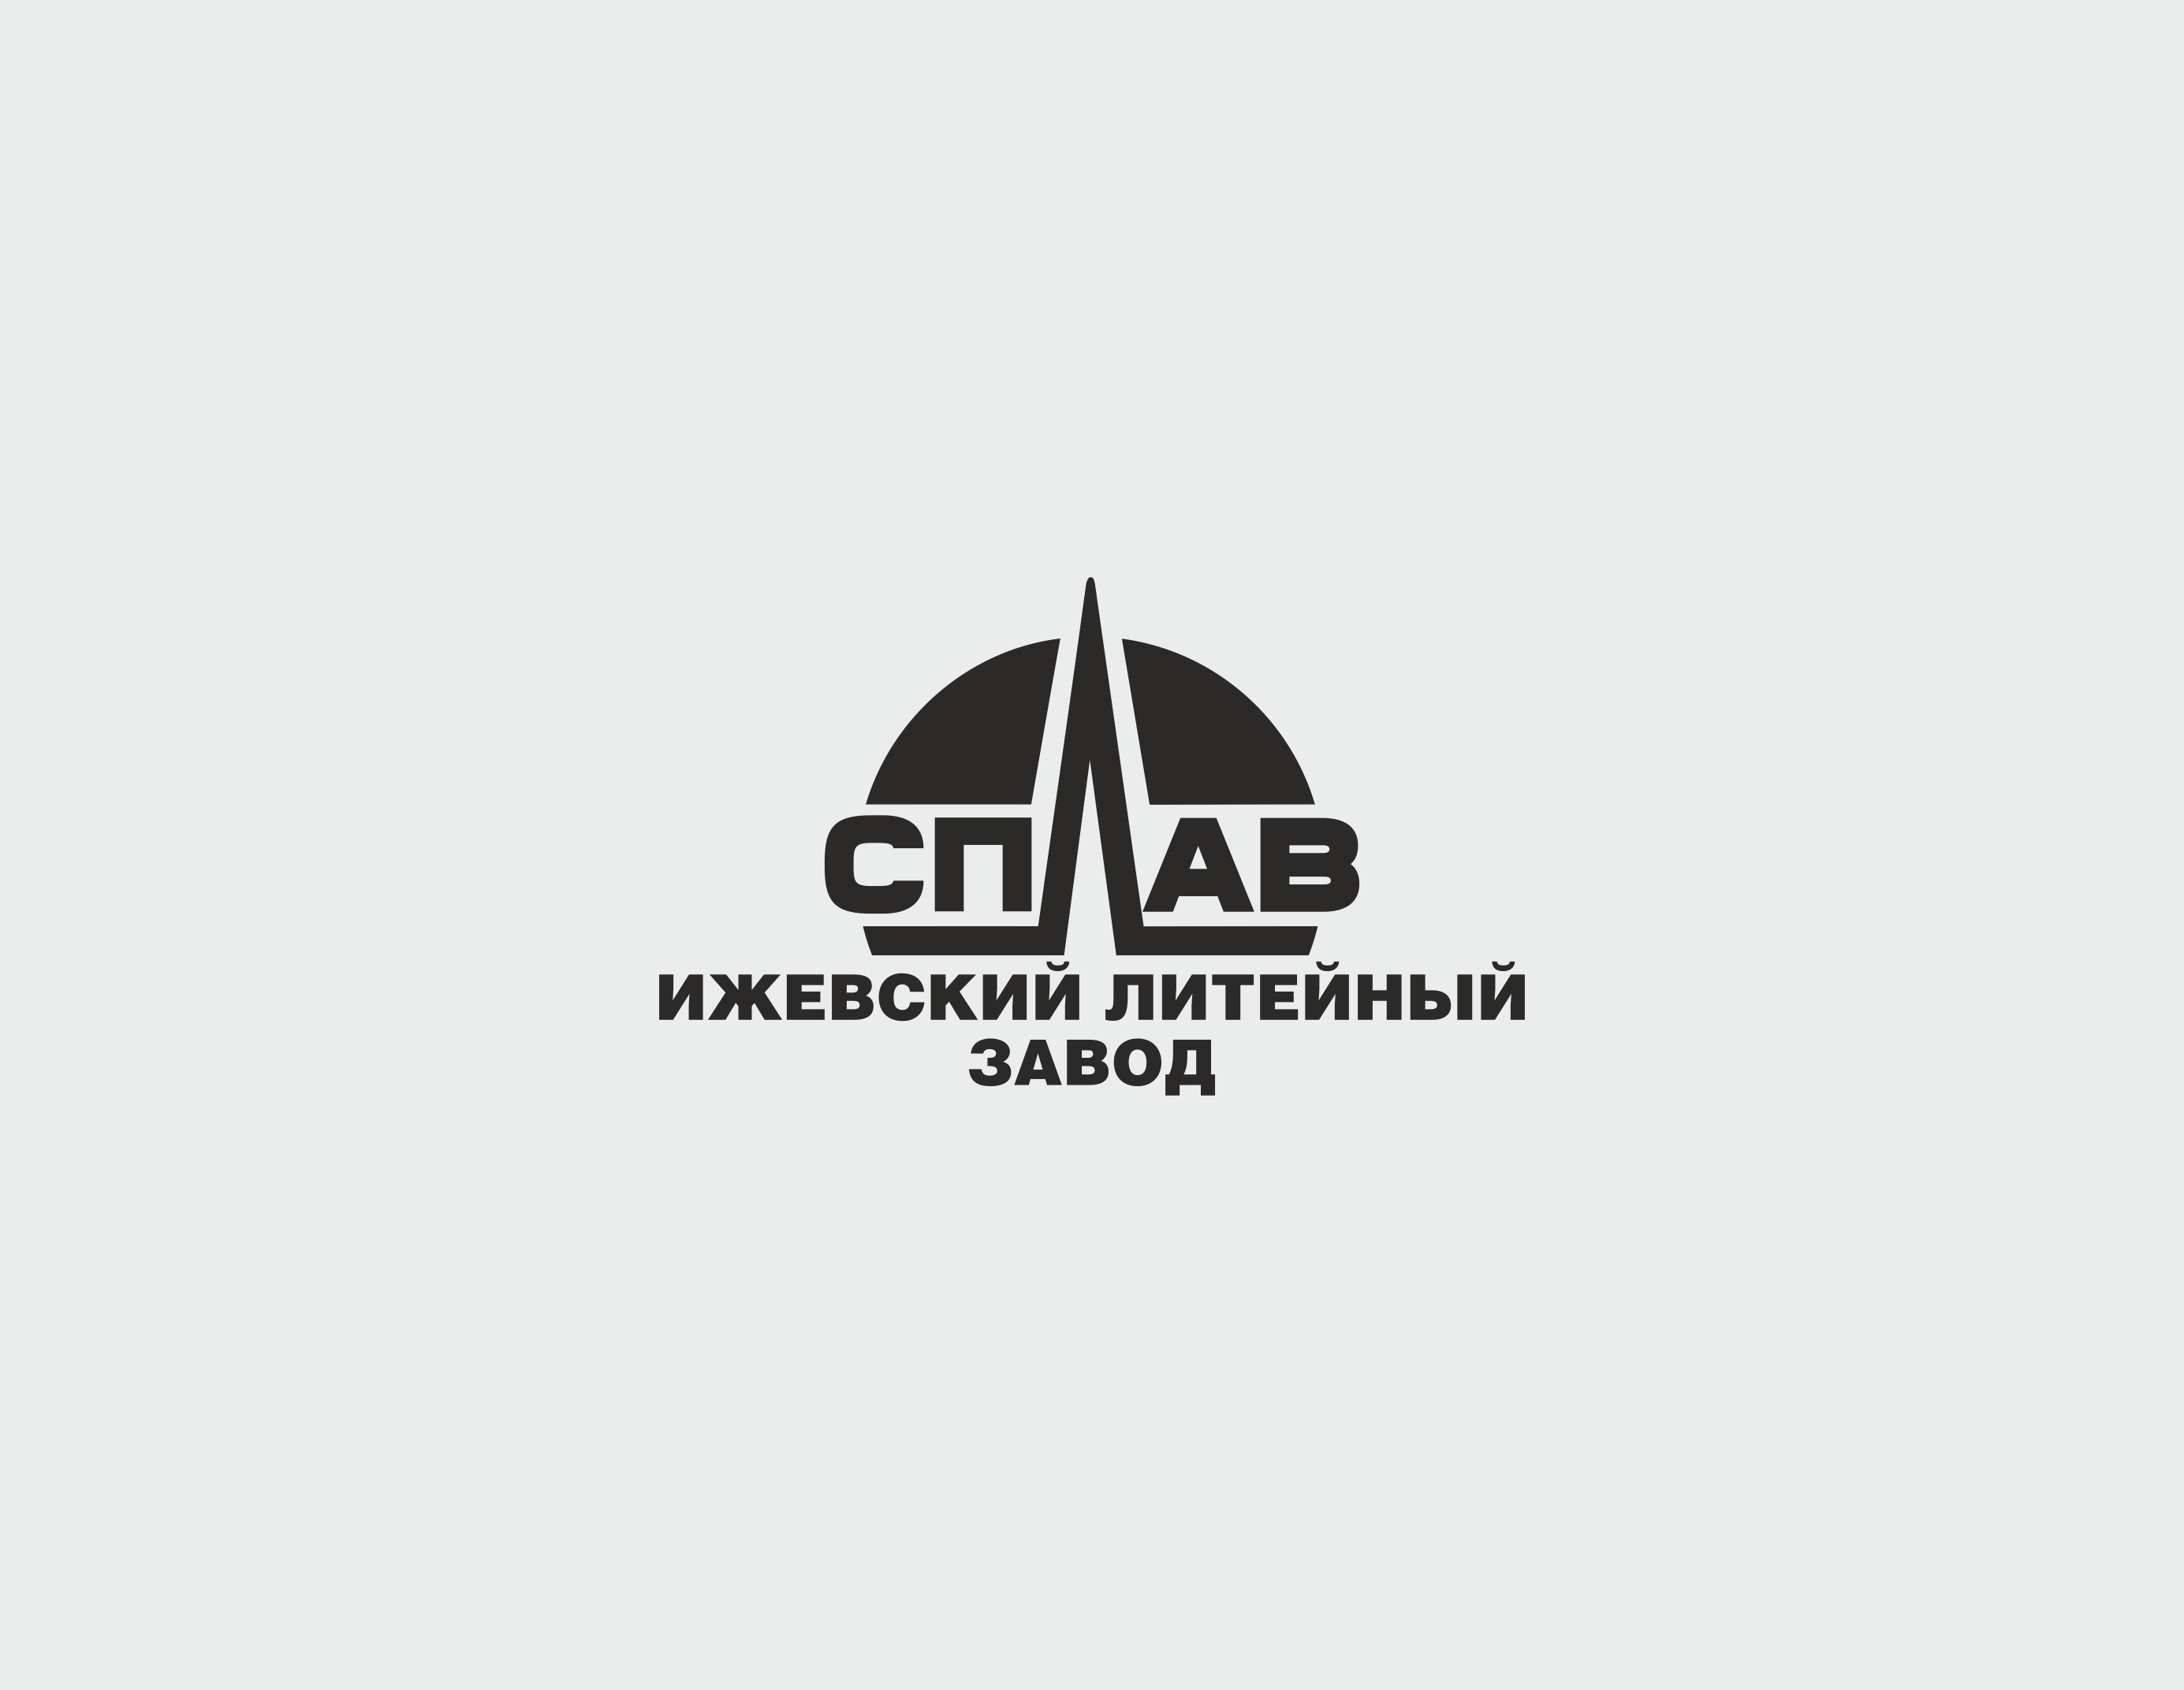 Разработать логотип для литейного завода фото f_6545b154956d1523.png